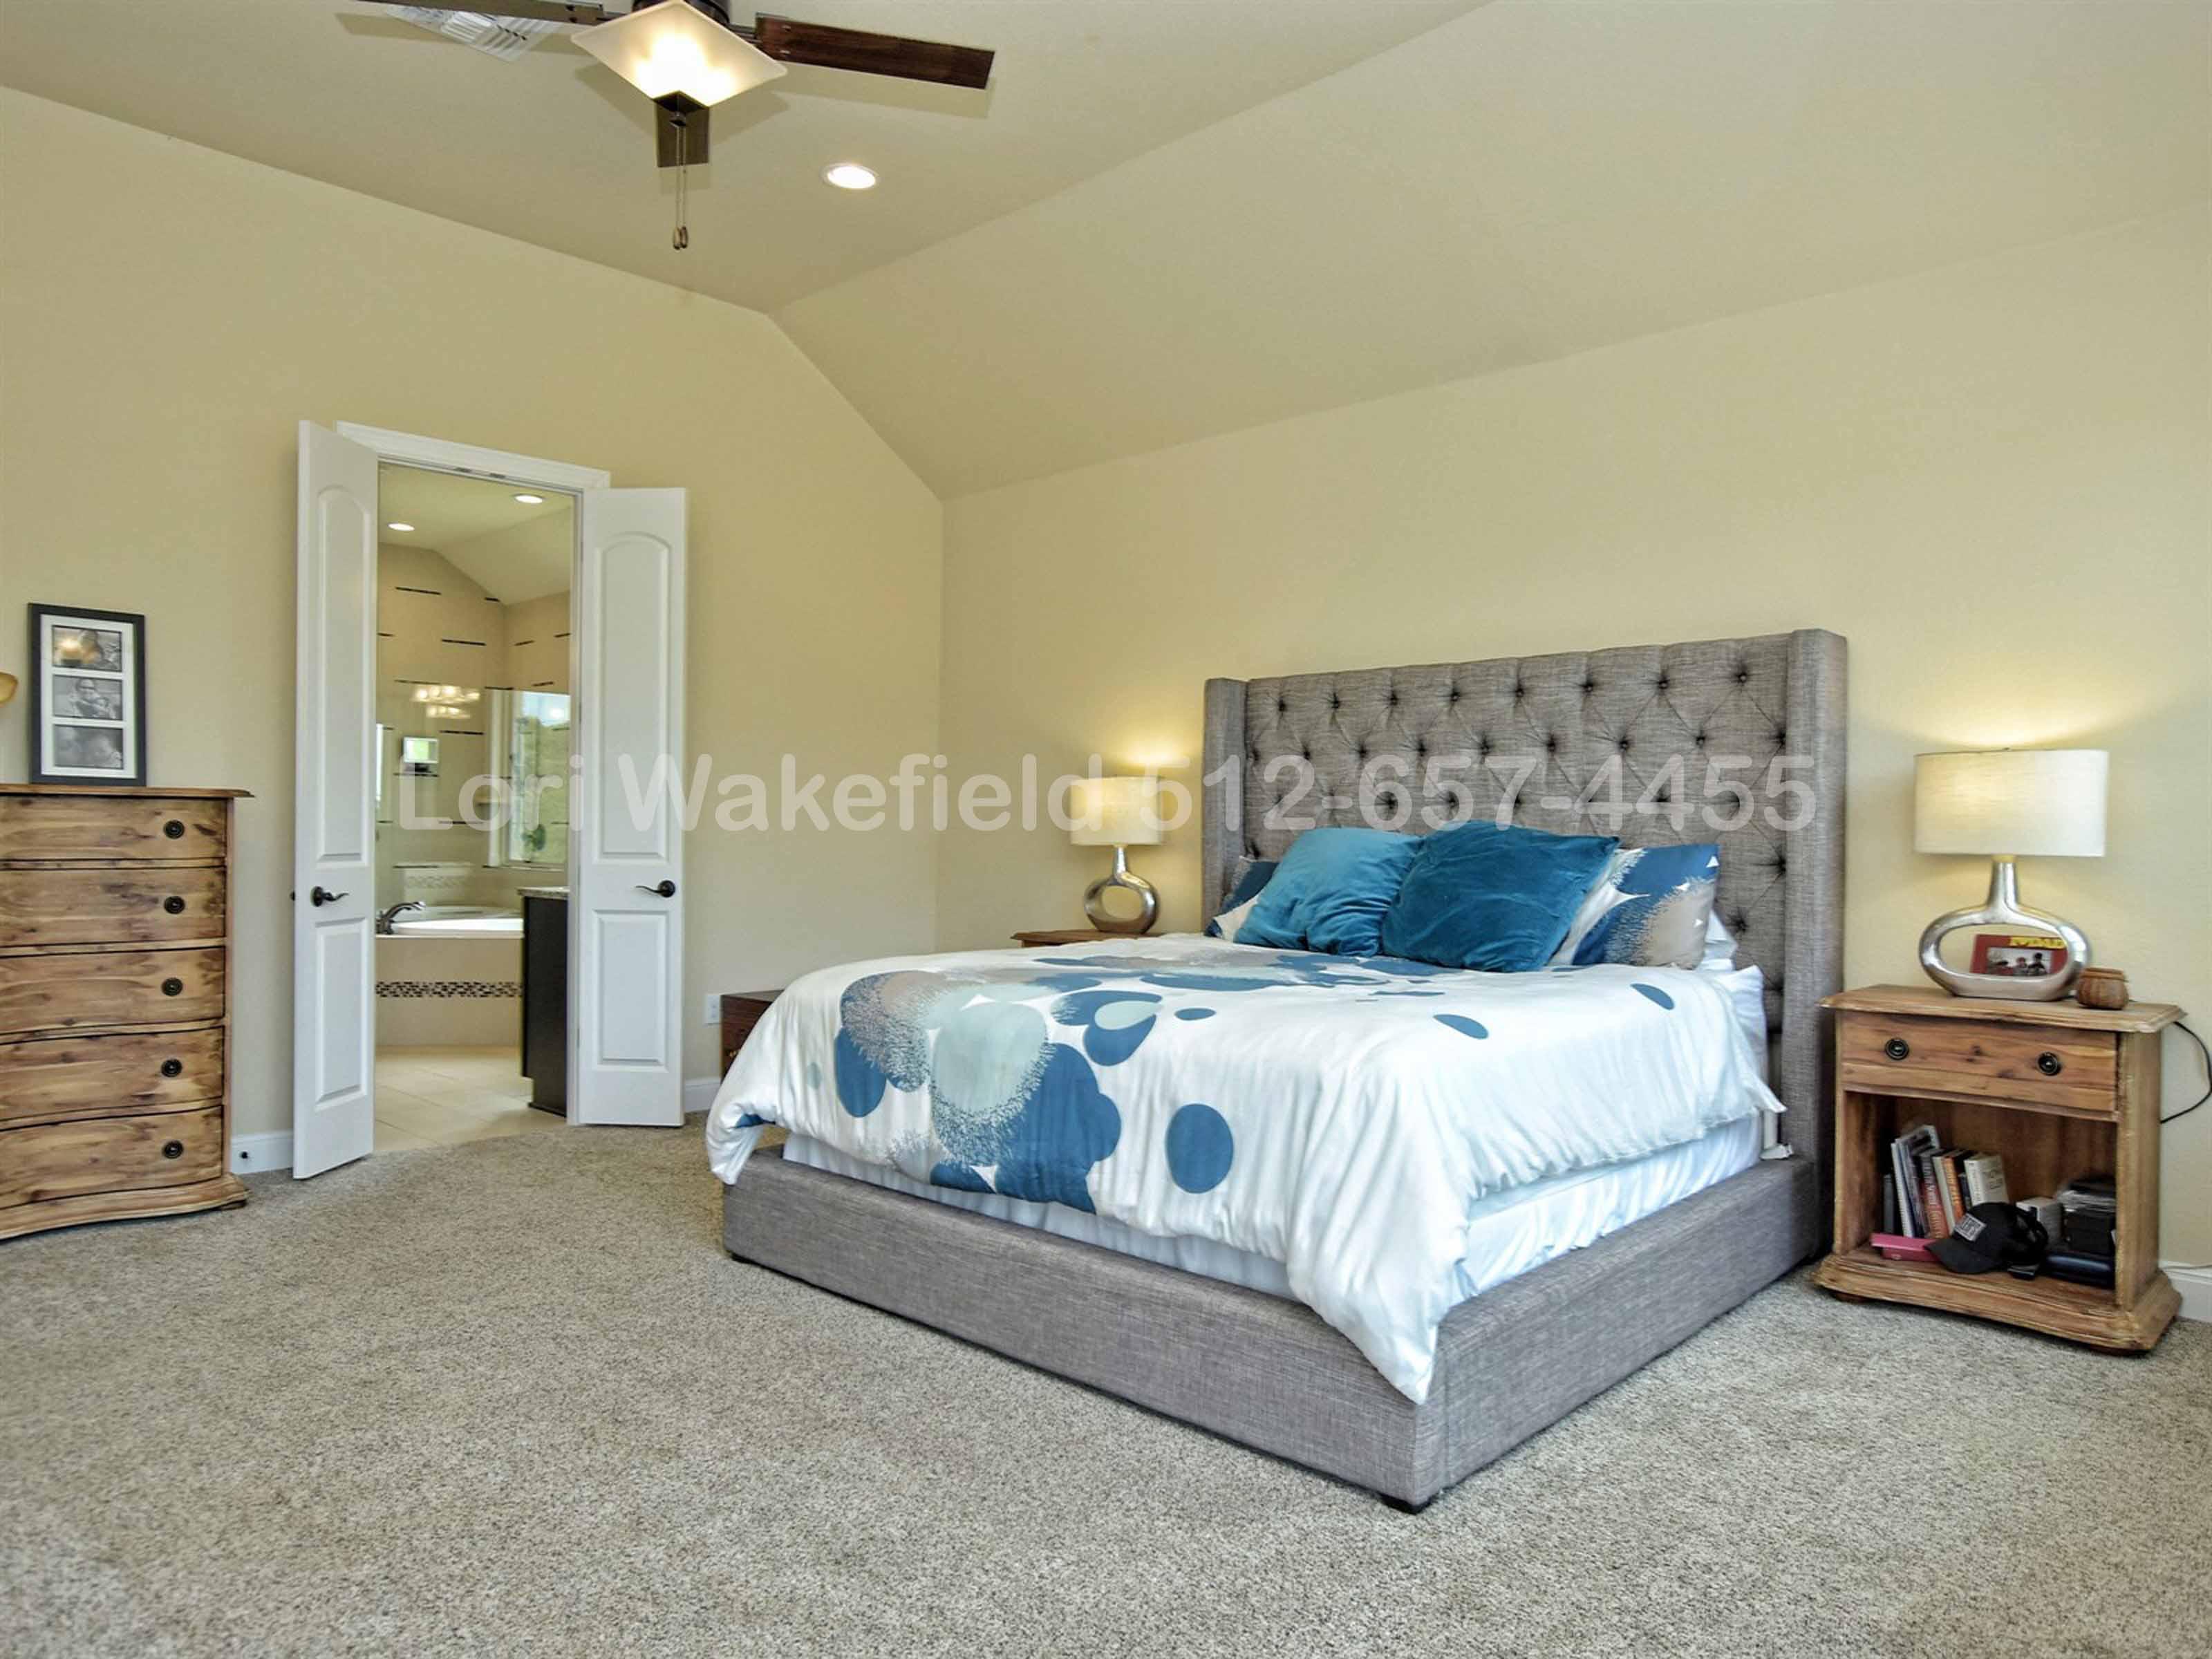 5421 Diamante Dr Spicewood TX | Lake Travis Home For Sale | Lori Wakefield REALTOR | Keller Williams Lake Travis